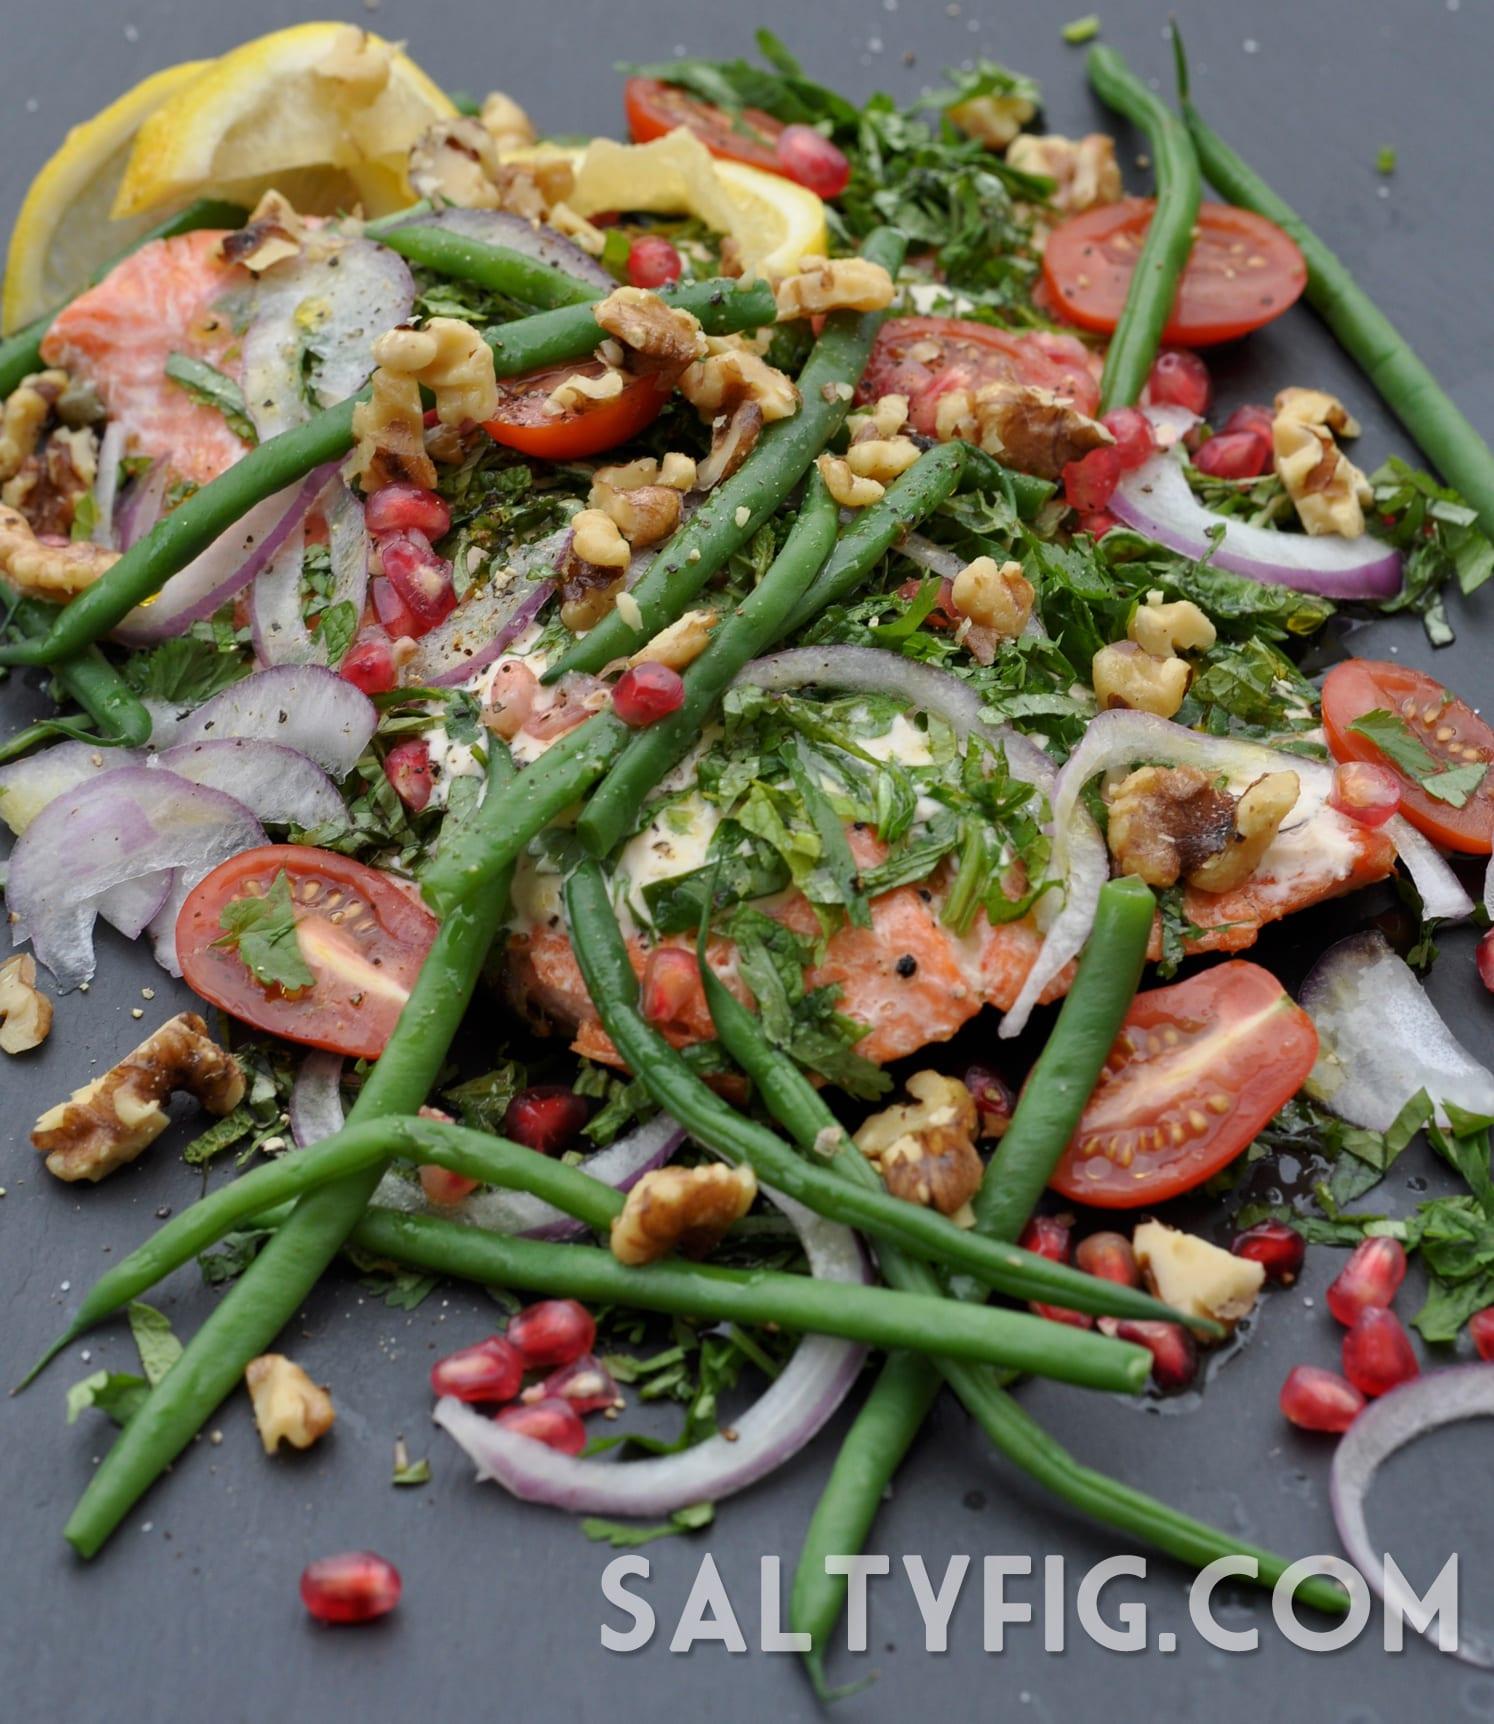 Oven Roasted Salmon with Tarator Sauce